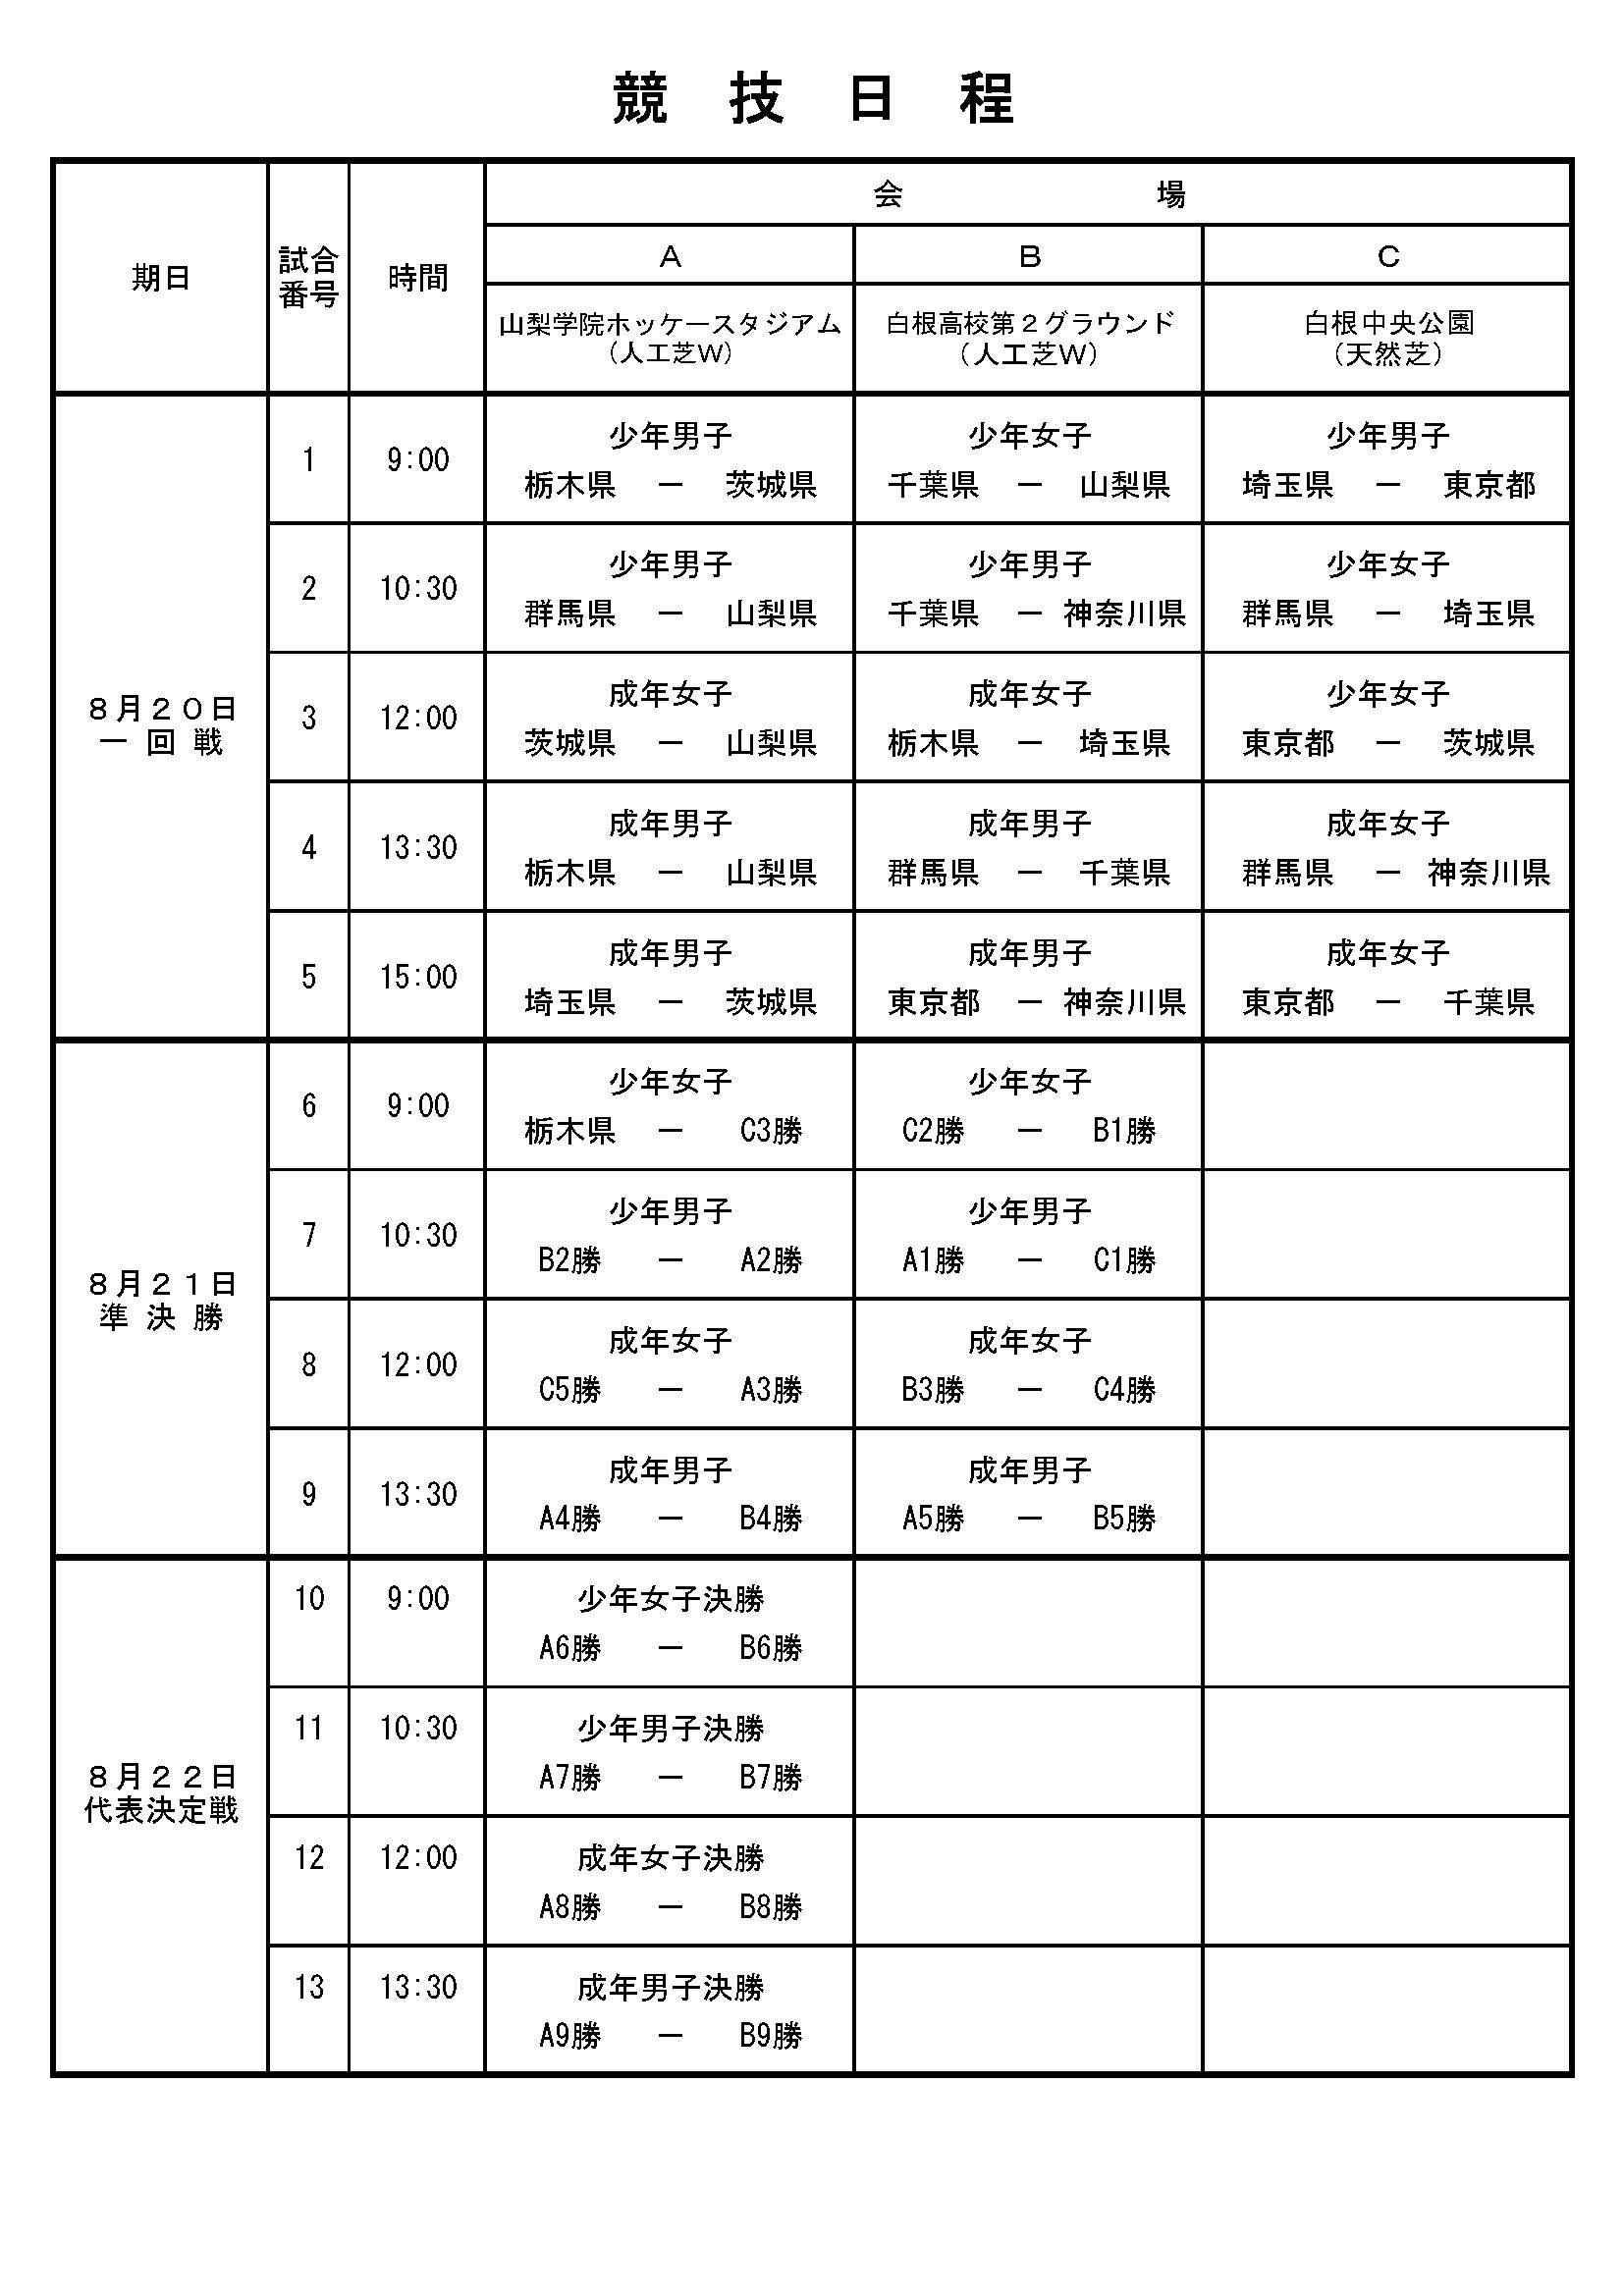 2016kokutai_block_tokyo01